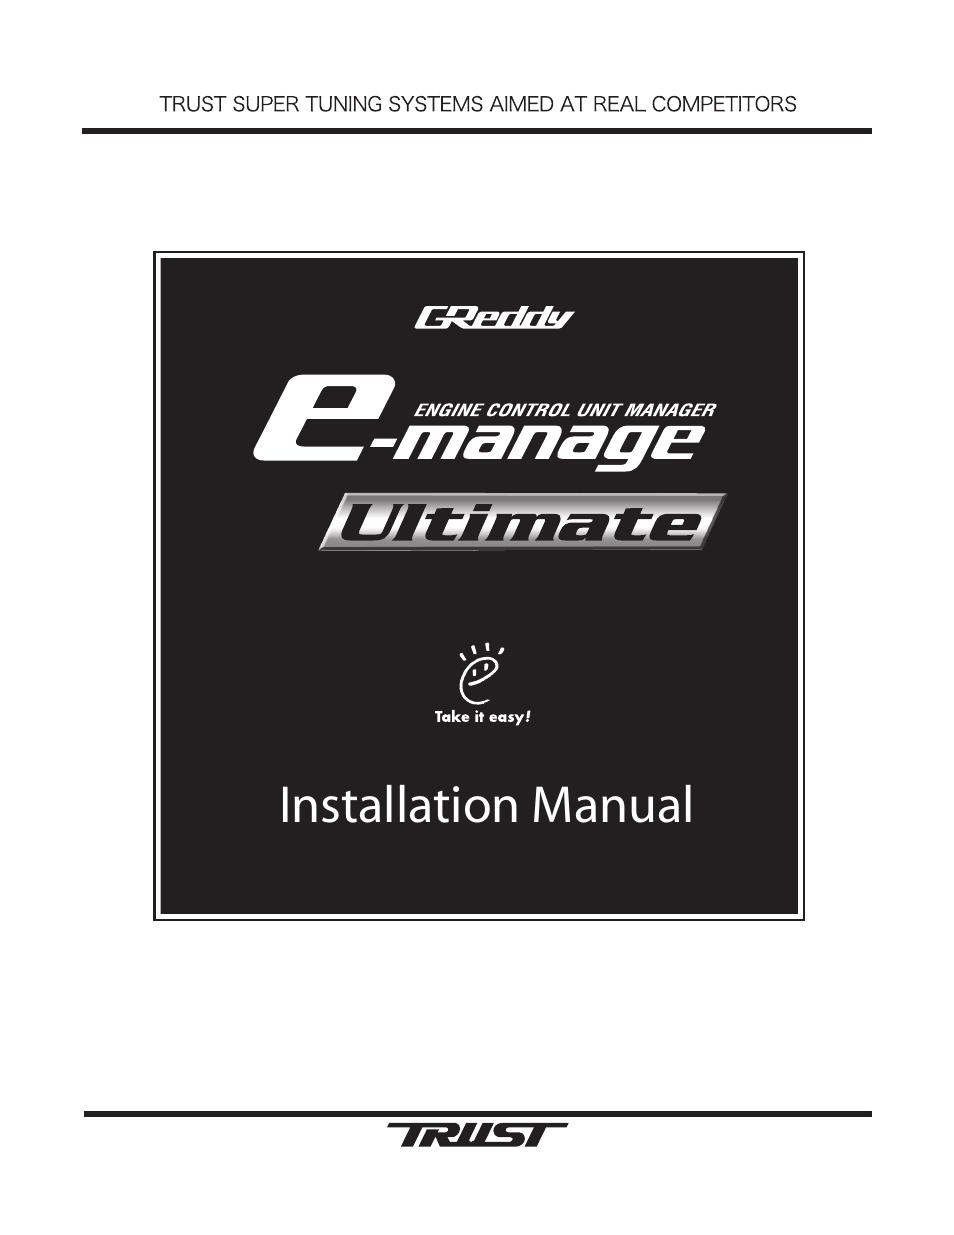 greddy e manage ultimate installation manual user manual 40 pages rh manualsdir com greddy emanage blue instruction manual G Reddy Emanage Blue